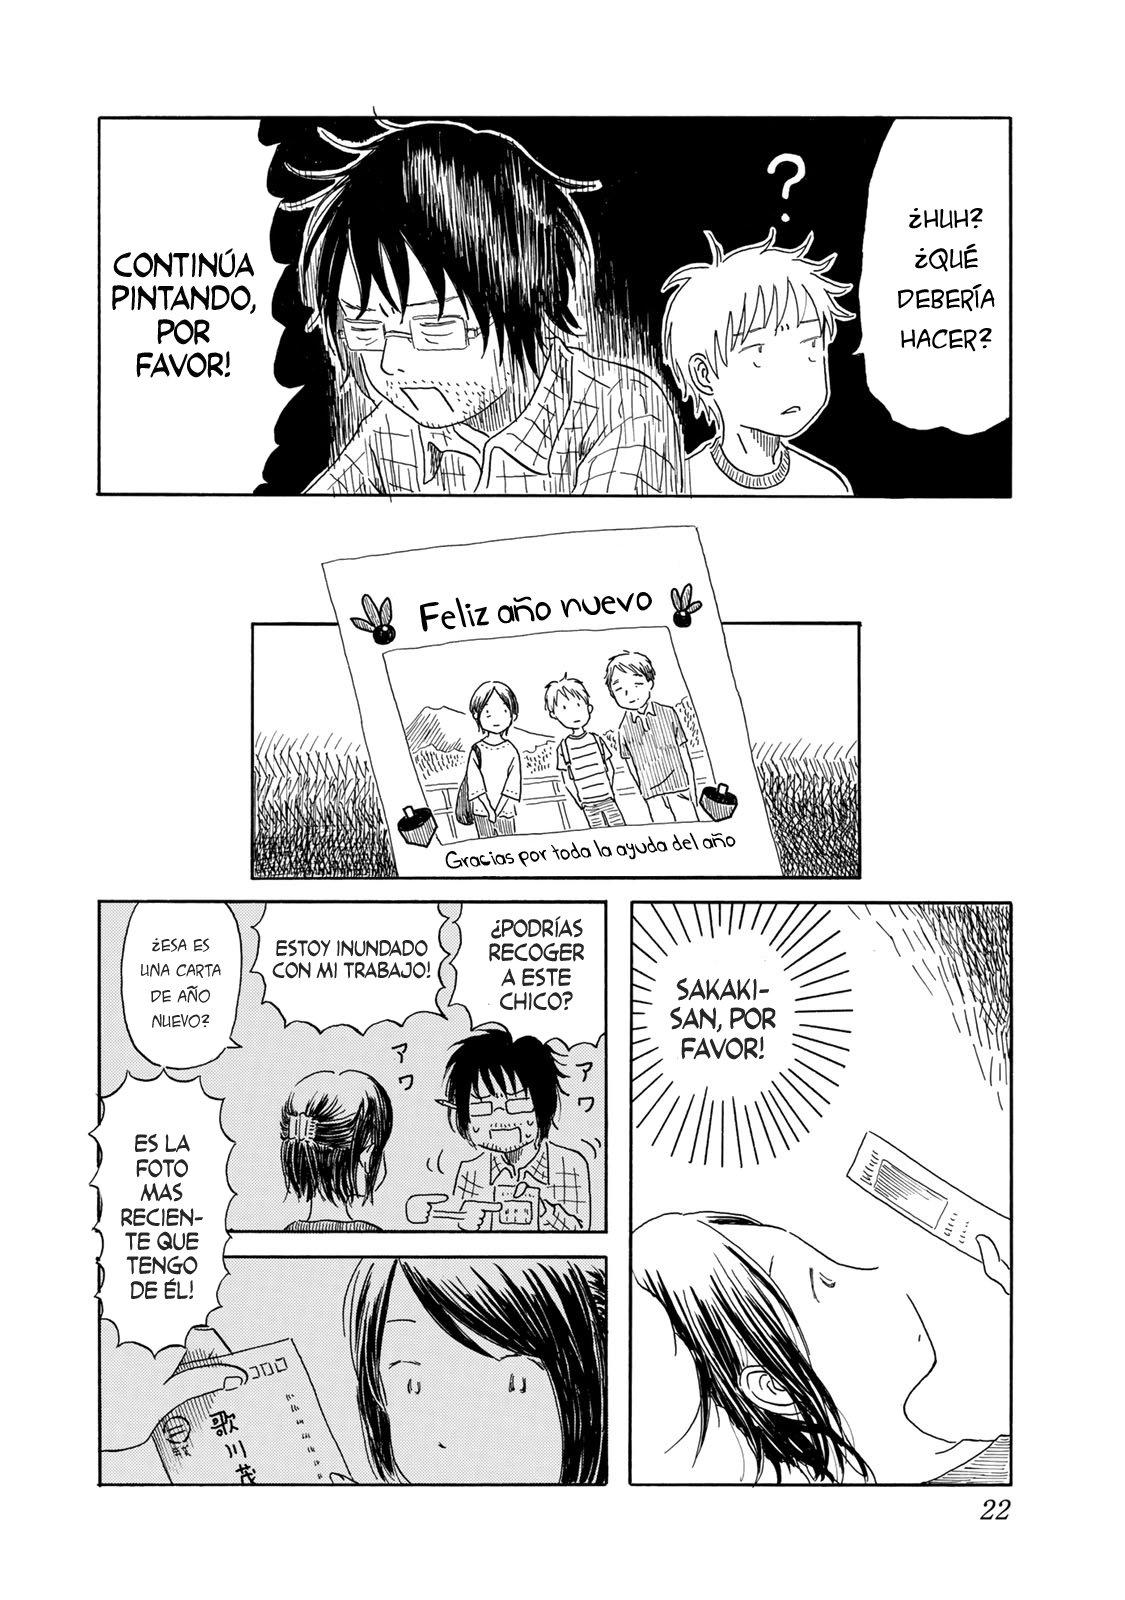 https://nine.mangadogs.com/es_manga/pic8/50/36658/946317/299dfffd8d3ae965d46057da7f2805d2.jpg Page 20